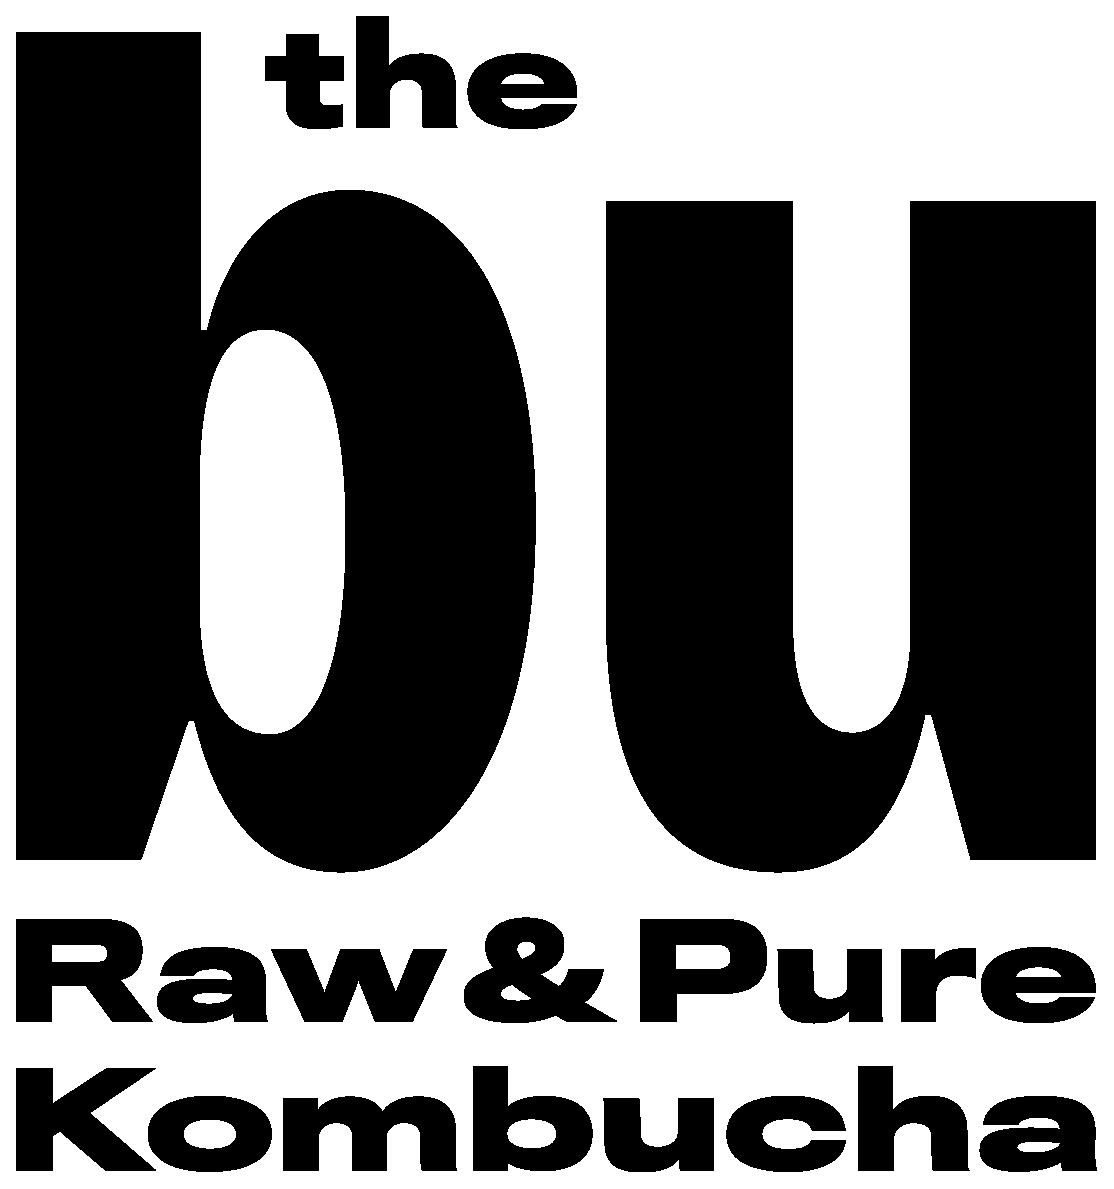 TheBU.lockup.RGB.black.png